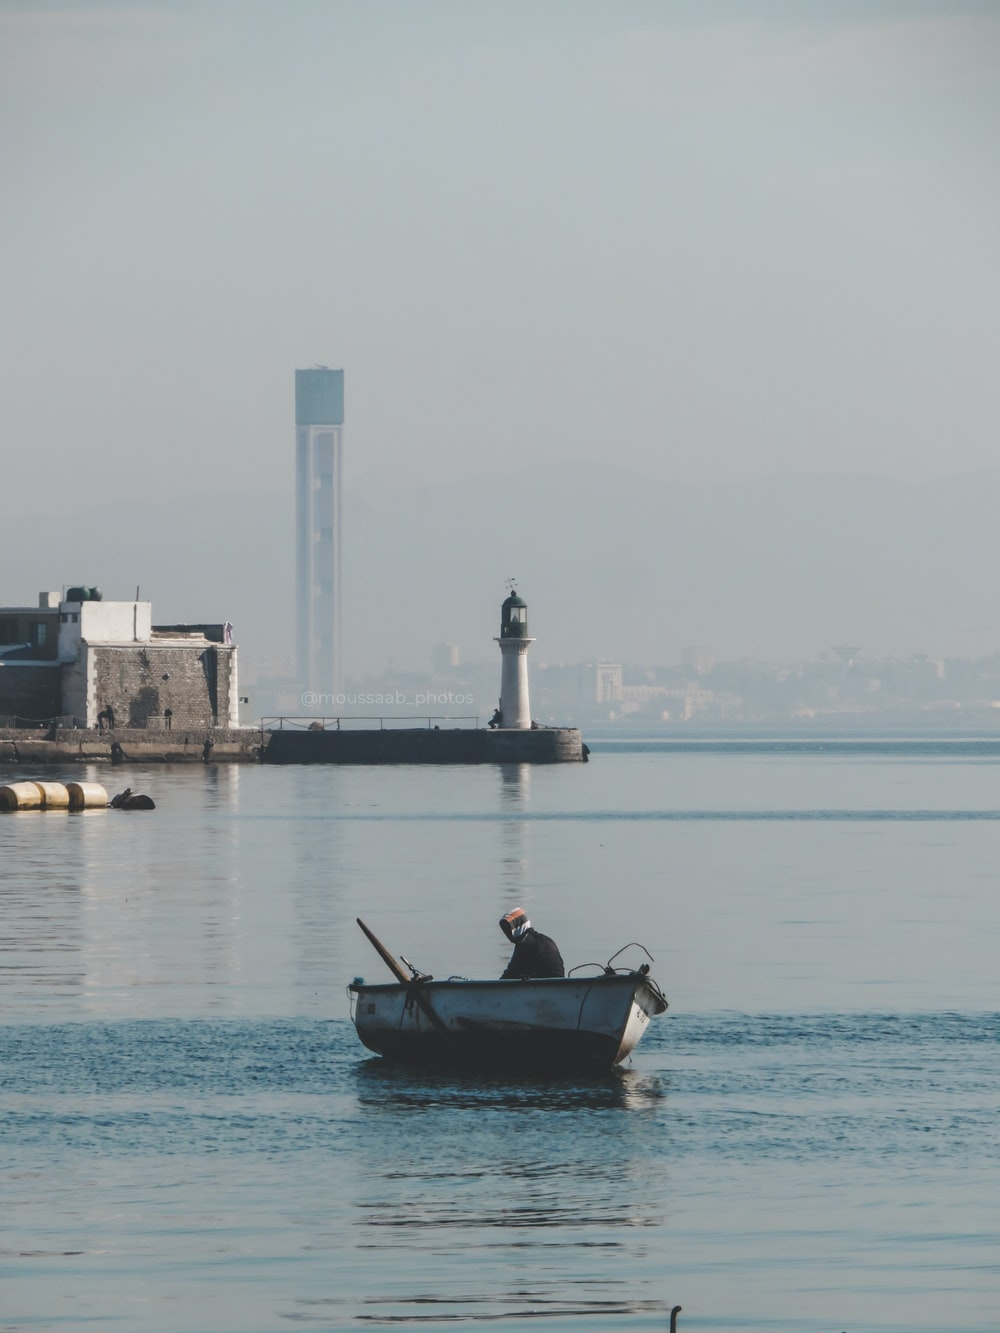 man in black shirt riding on boat during daytime